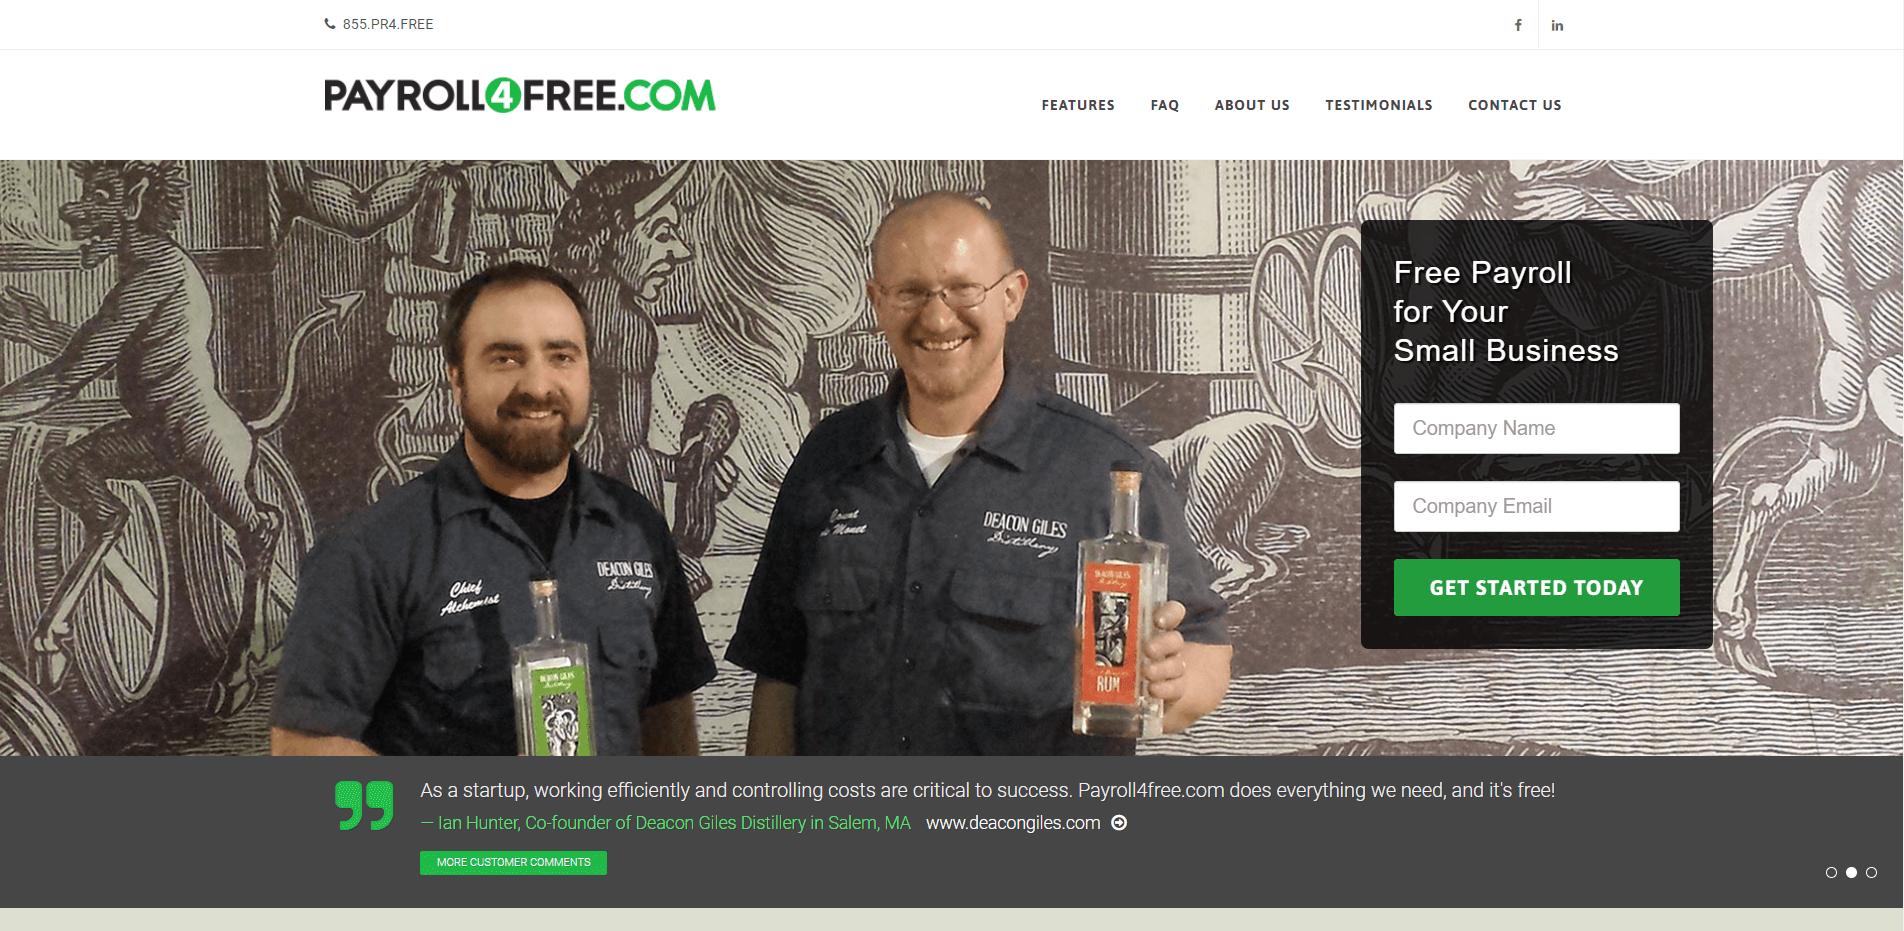 Payroll4Free's homepage.